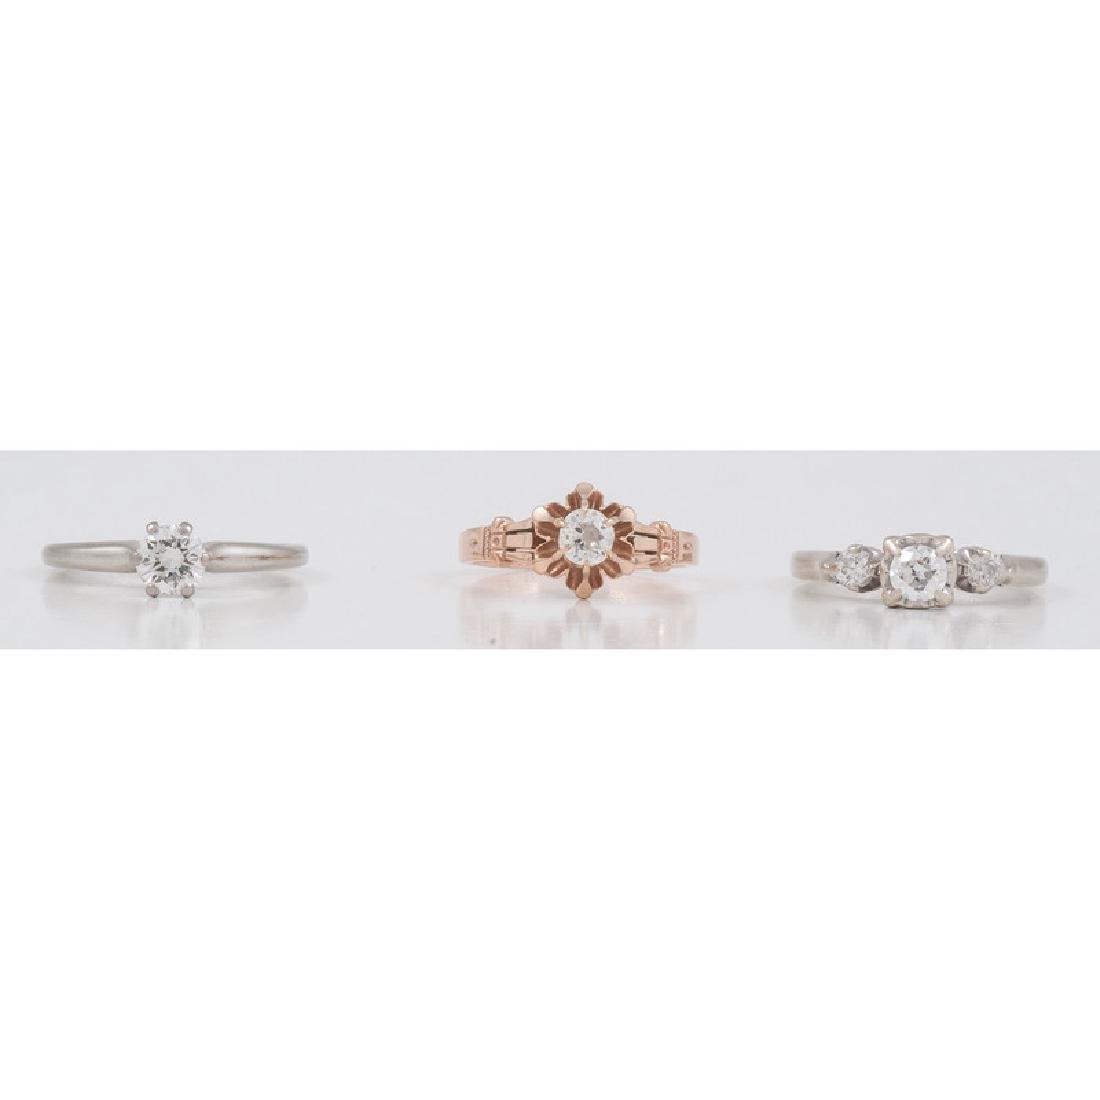 Diamond Rings in Karat Gold